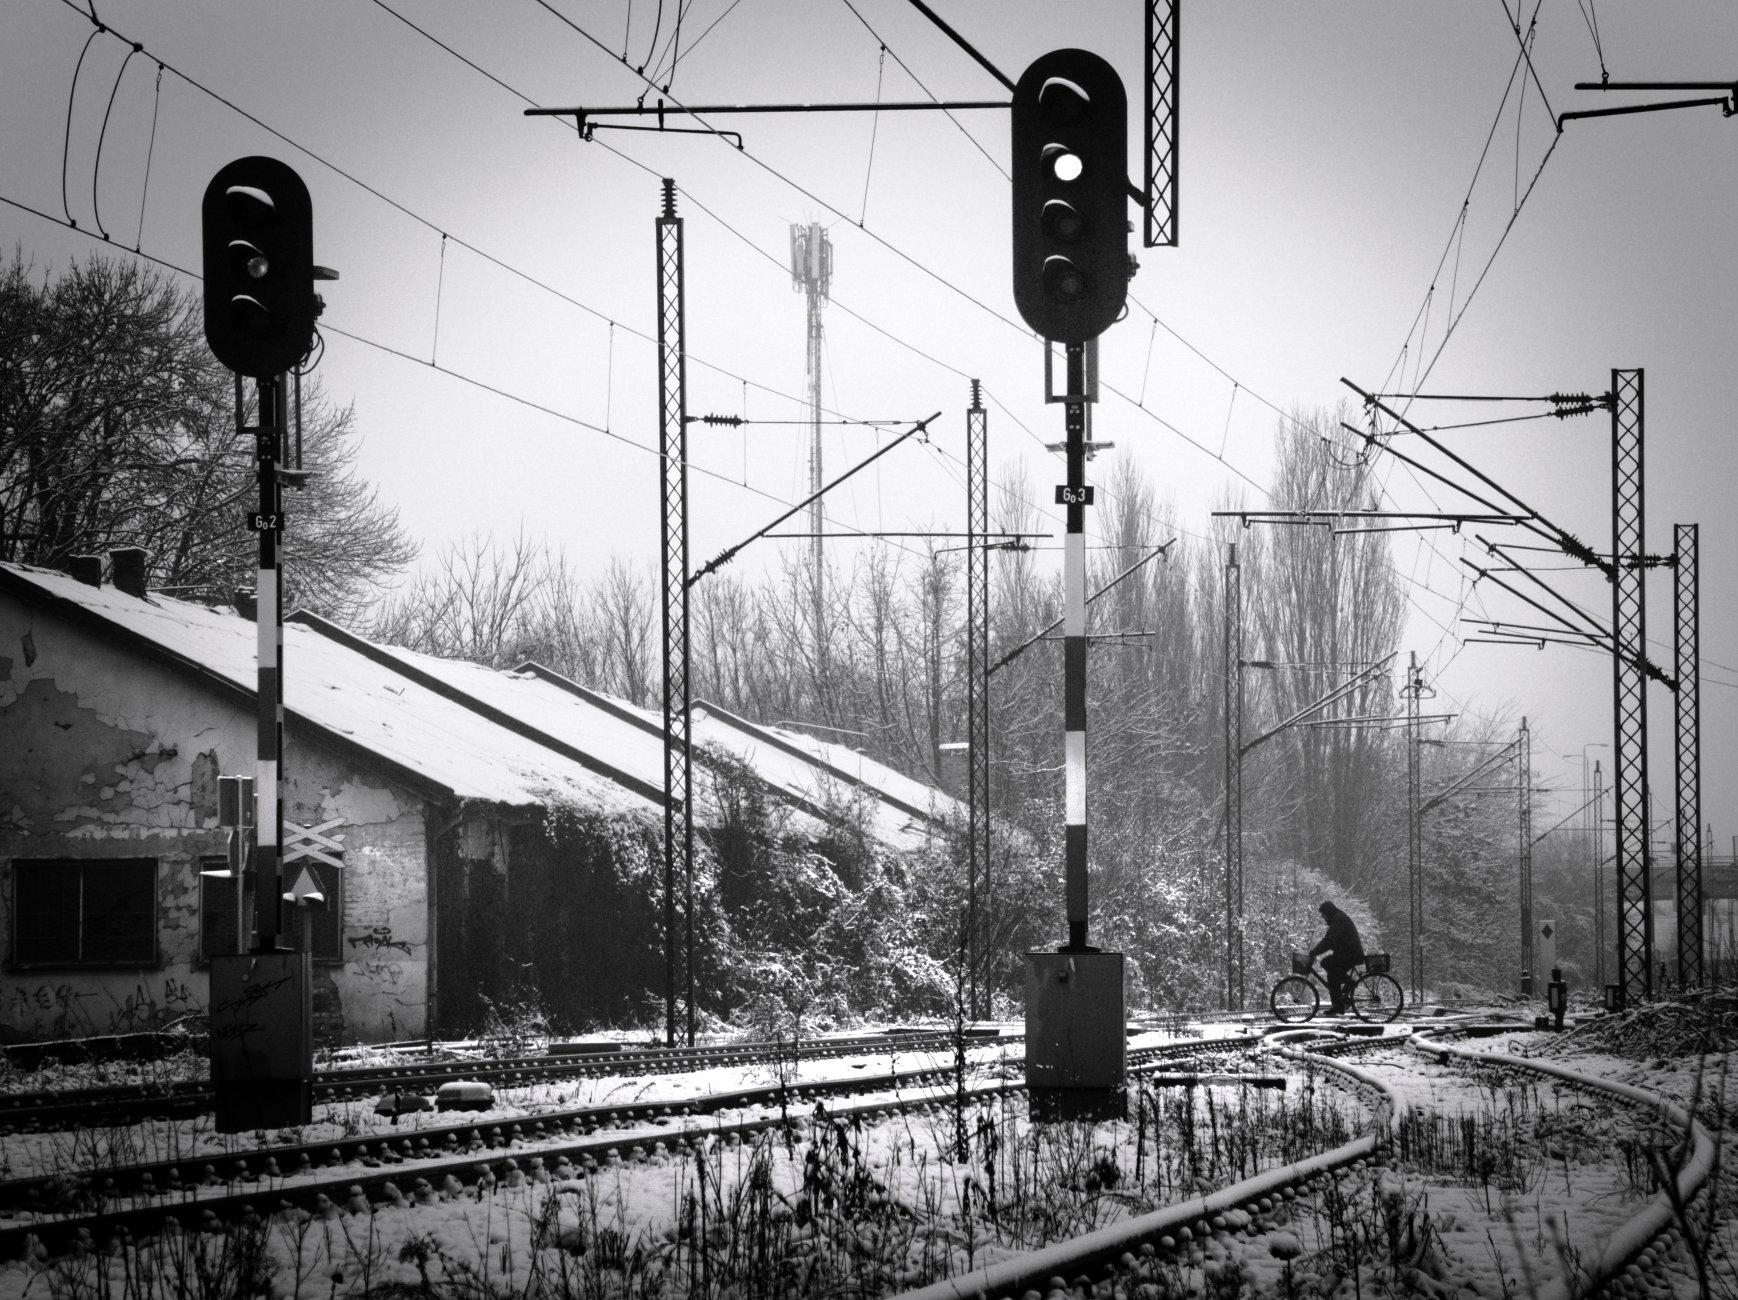 About the railway - XXXV